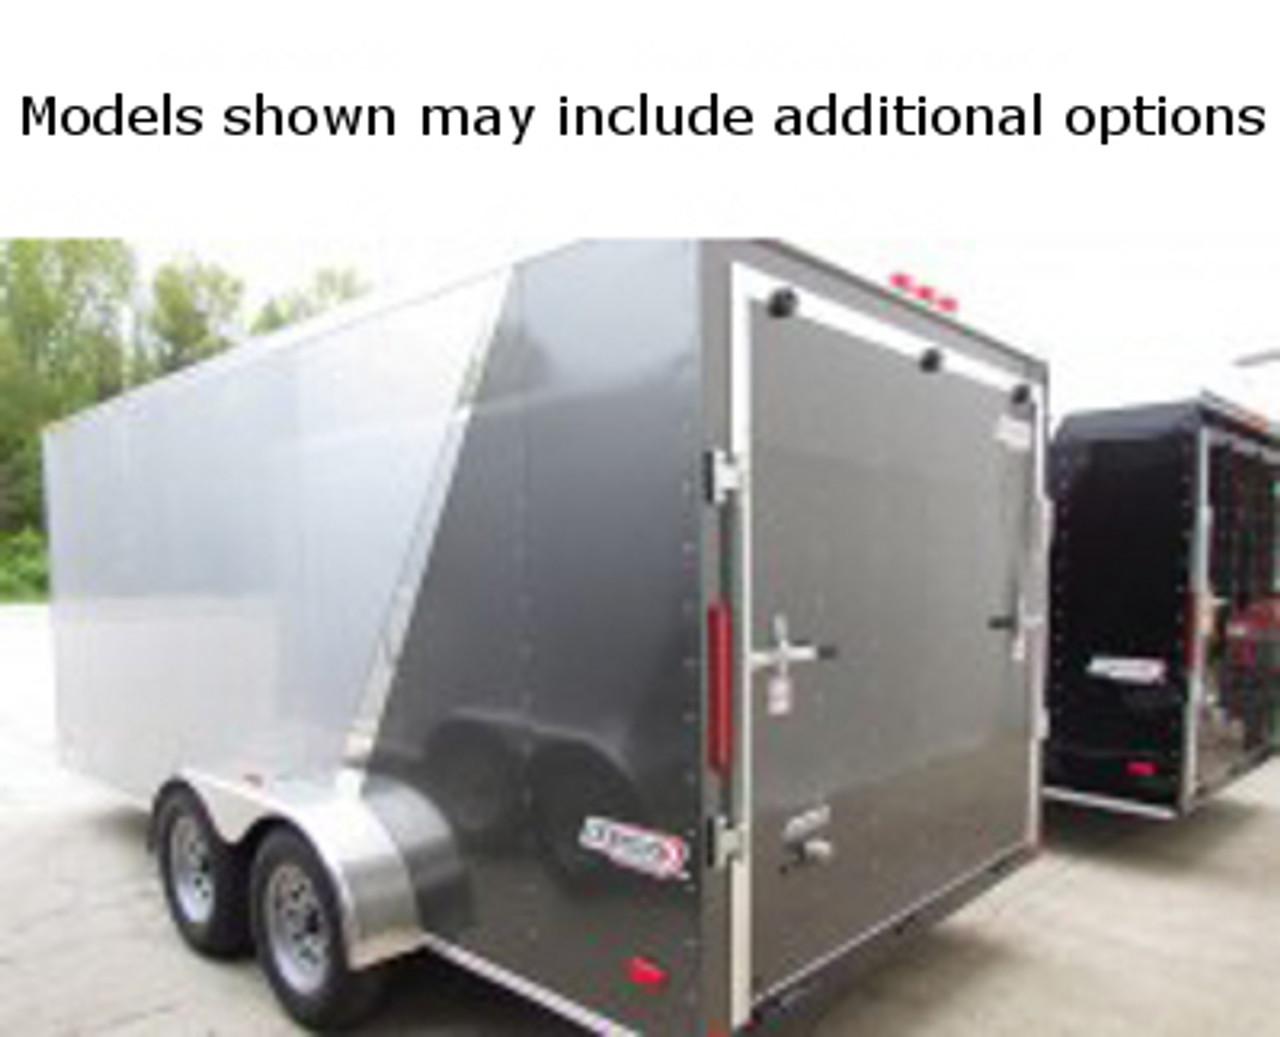 SC714TA2DSS --- 7' X 14' Enclosed Tandem Trailer with Double Rear Doors - Torsion - Bravo